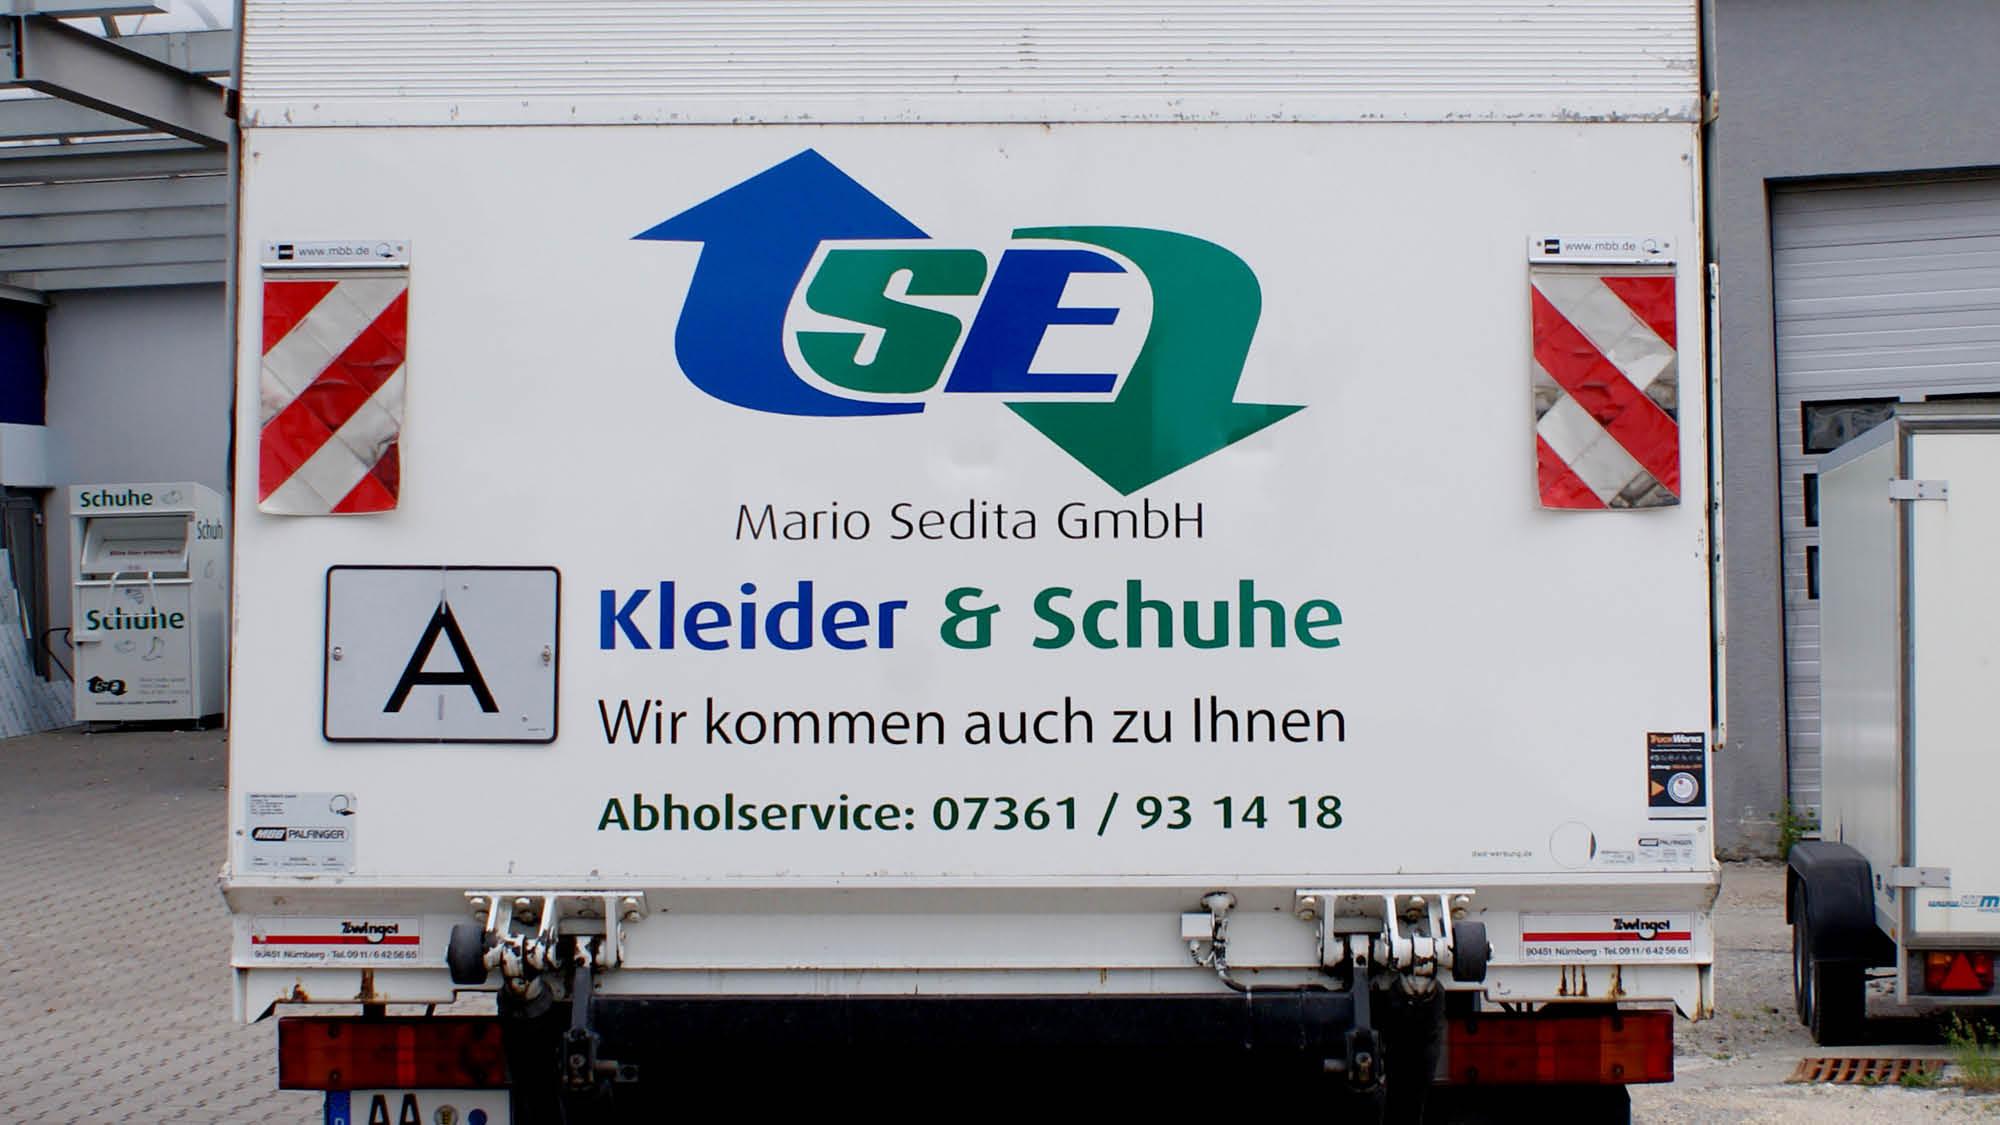 Mario Sedita GmbH - Aalen - LKW - Fahrzeugbeschriftung - 2019 - DSC02497